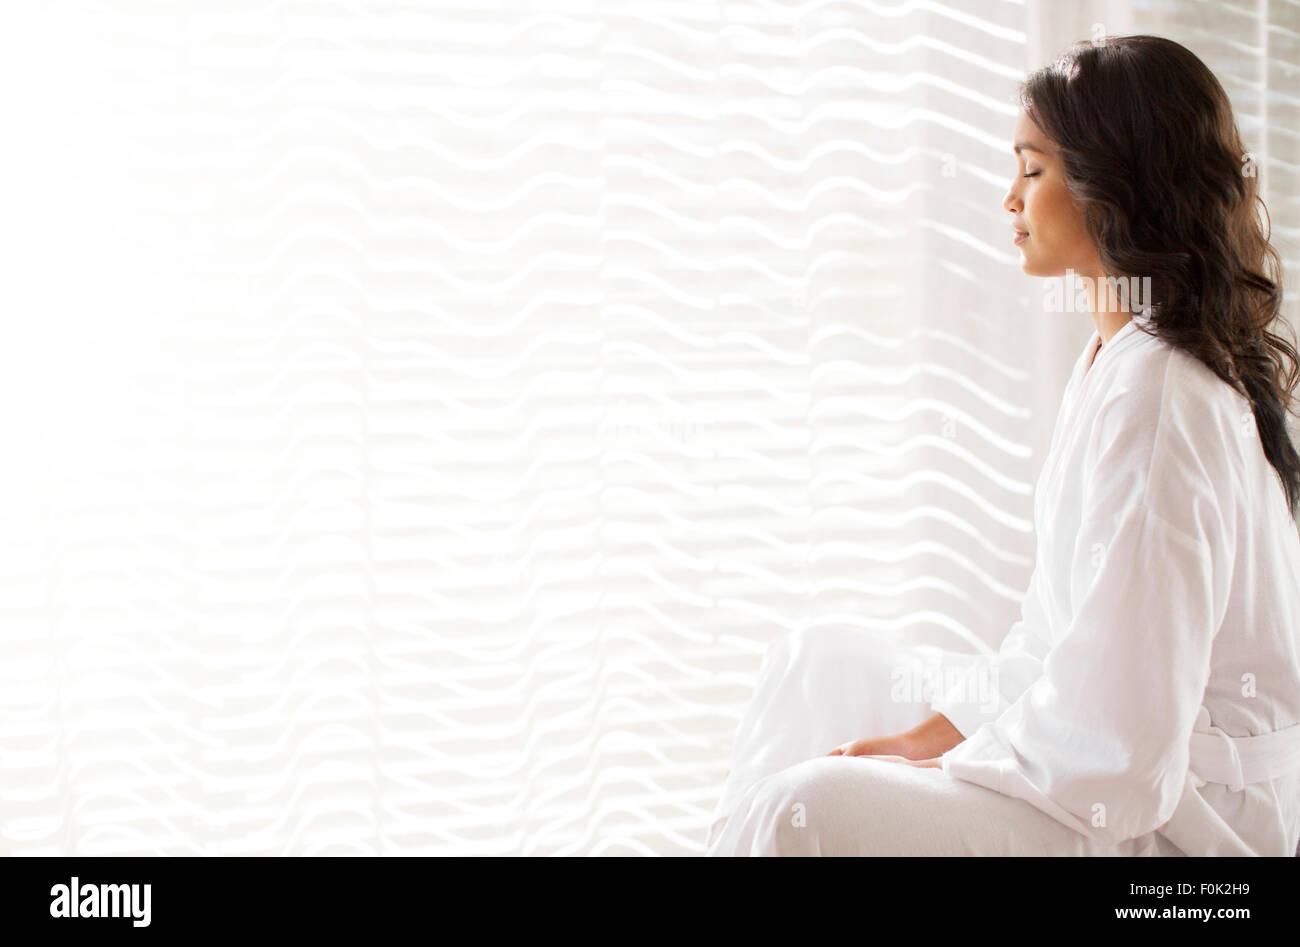 Serene woman in bathrobe meditating at sunny window - Stock Image